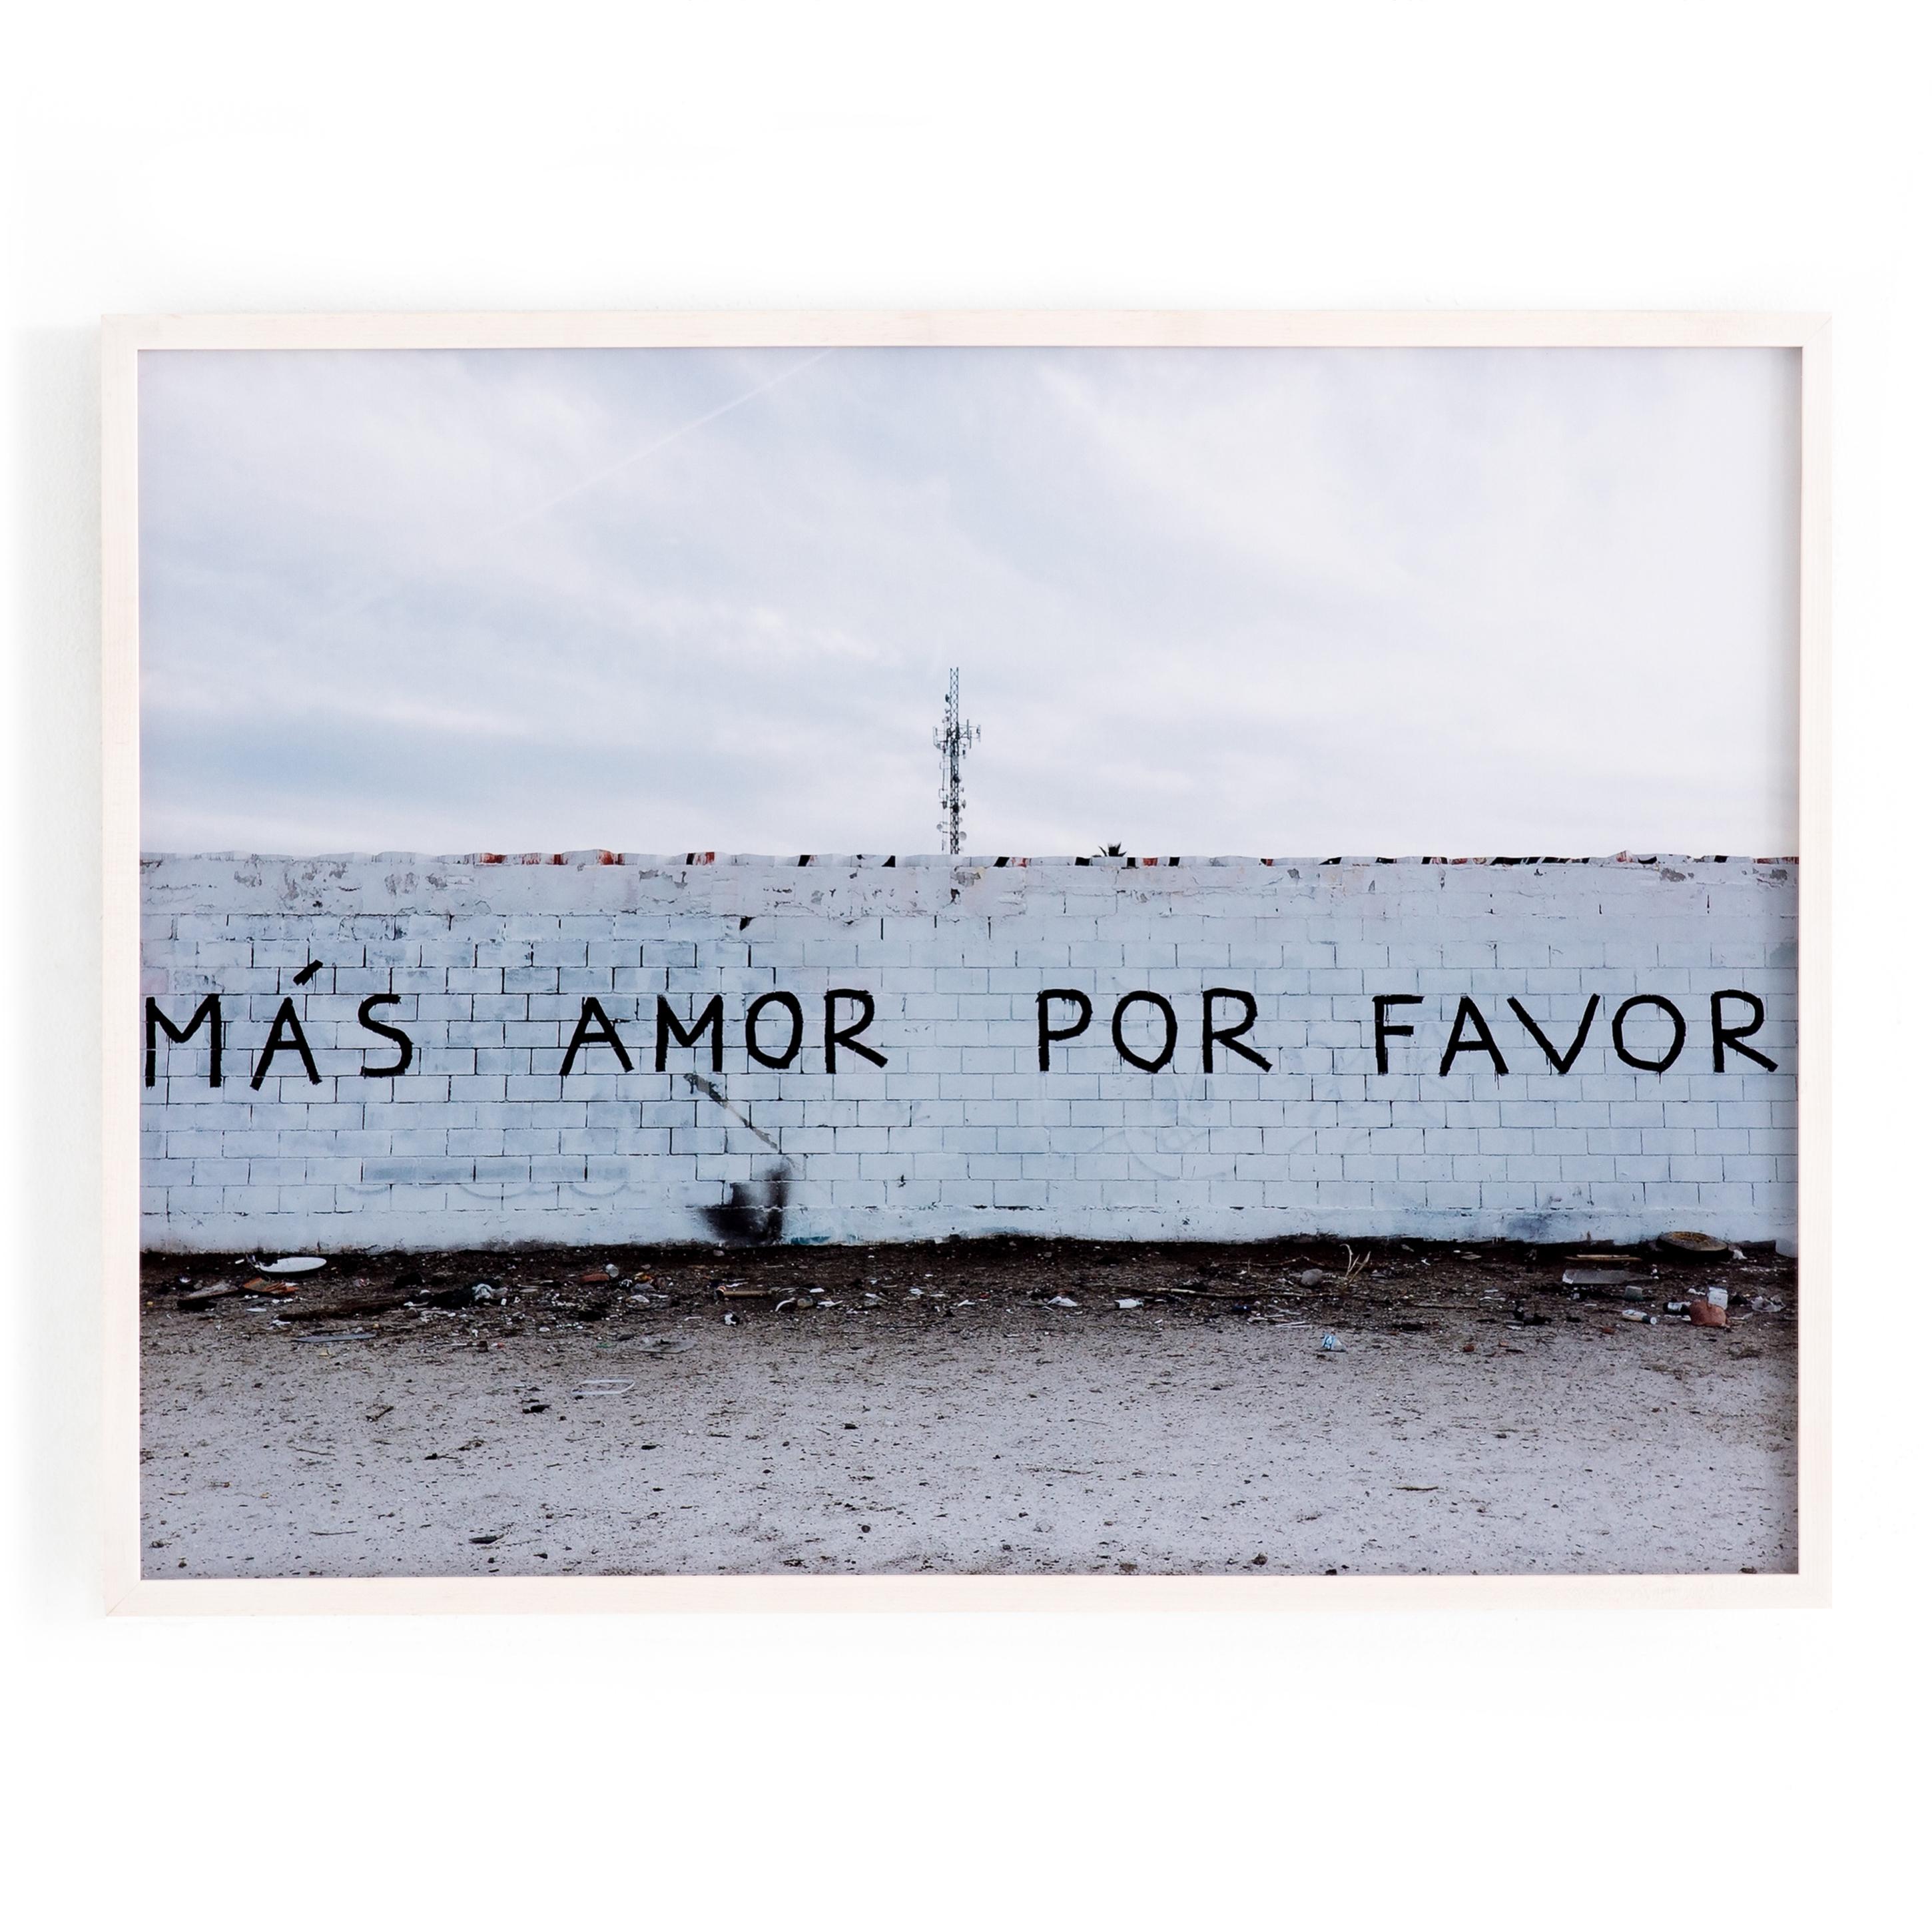 Mas Amore